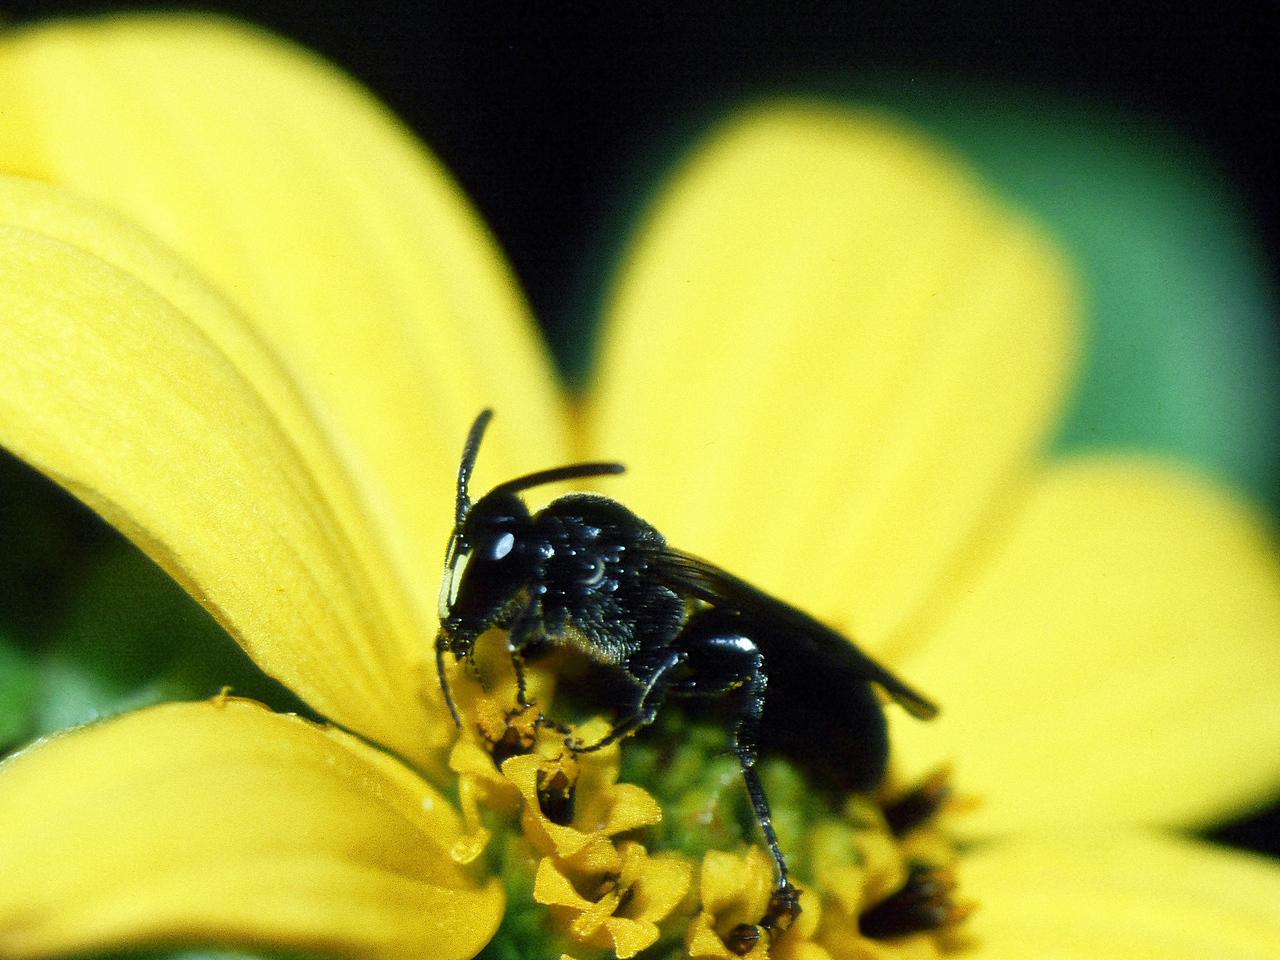 Hylaeus sp. (Hymenoptera: Colletidae) on Lipochaeta lobata, West Maui